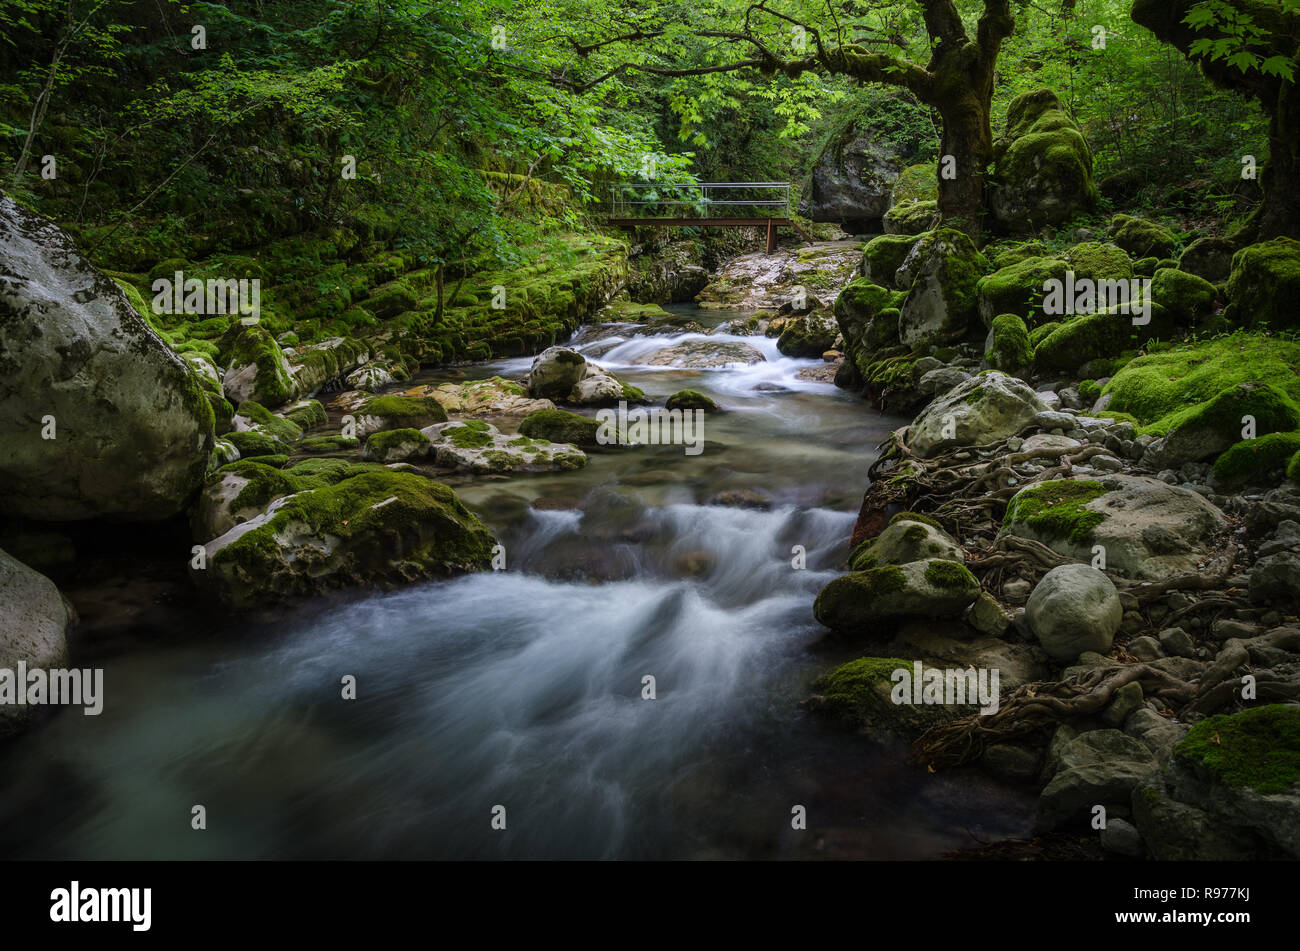 Chrousia river between Sirrako and Kalarrites villages - Stock Image